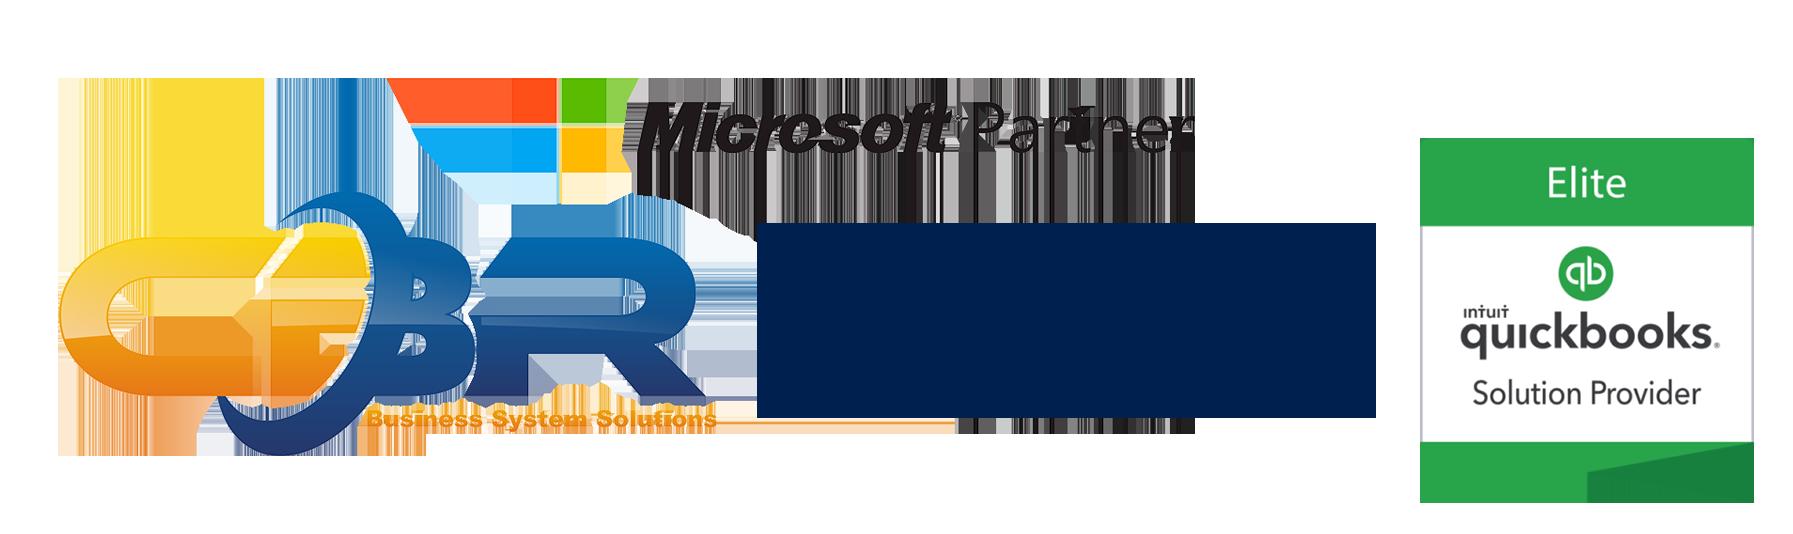 Microsoft & Intuit News by CBR Tech